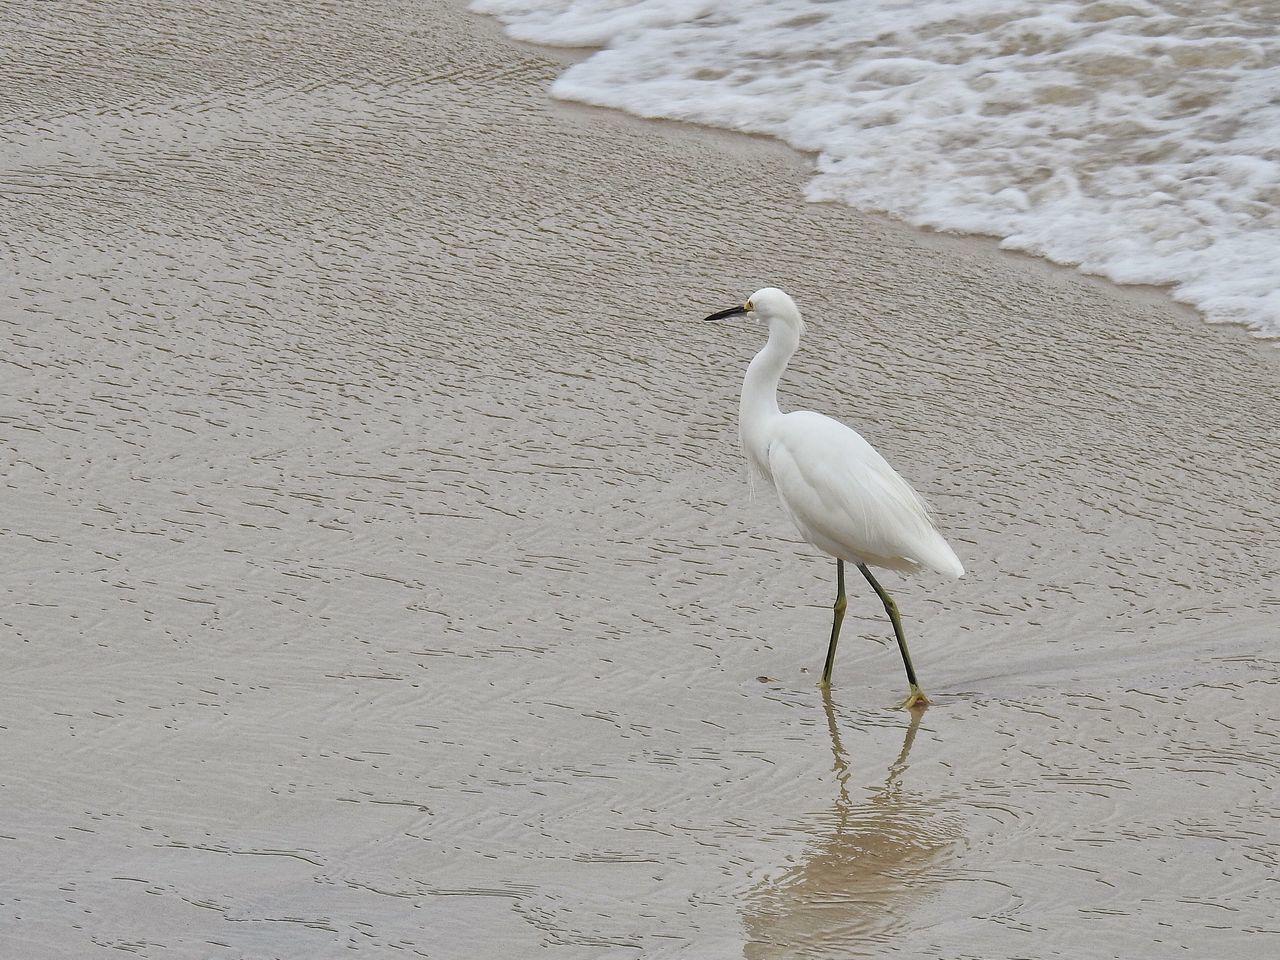 Sand Beach Water Garças Caraguatatuba_sp Caragua Caraguatatuba Litoralnorte Litoralsp Litoral